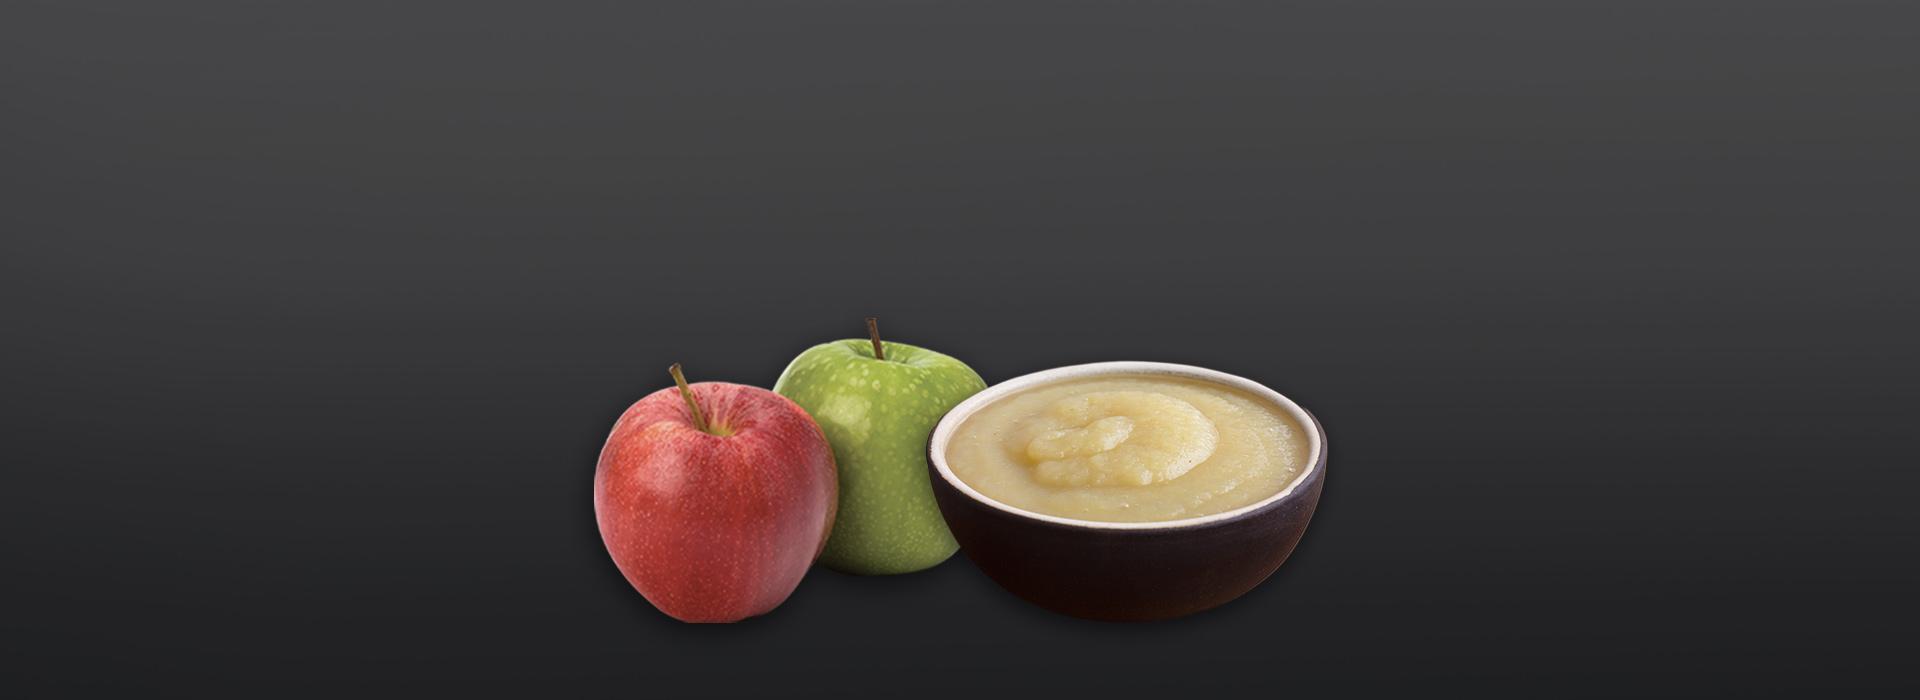 Sraml-Pome-fruit-puree